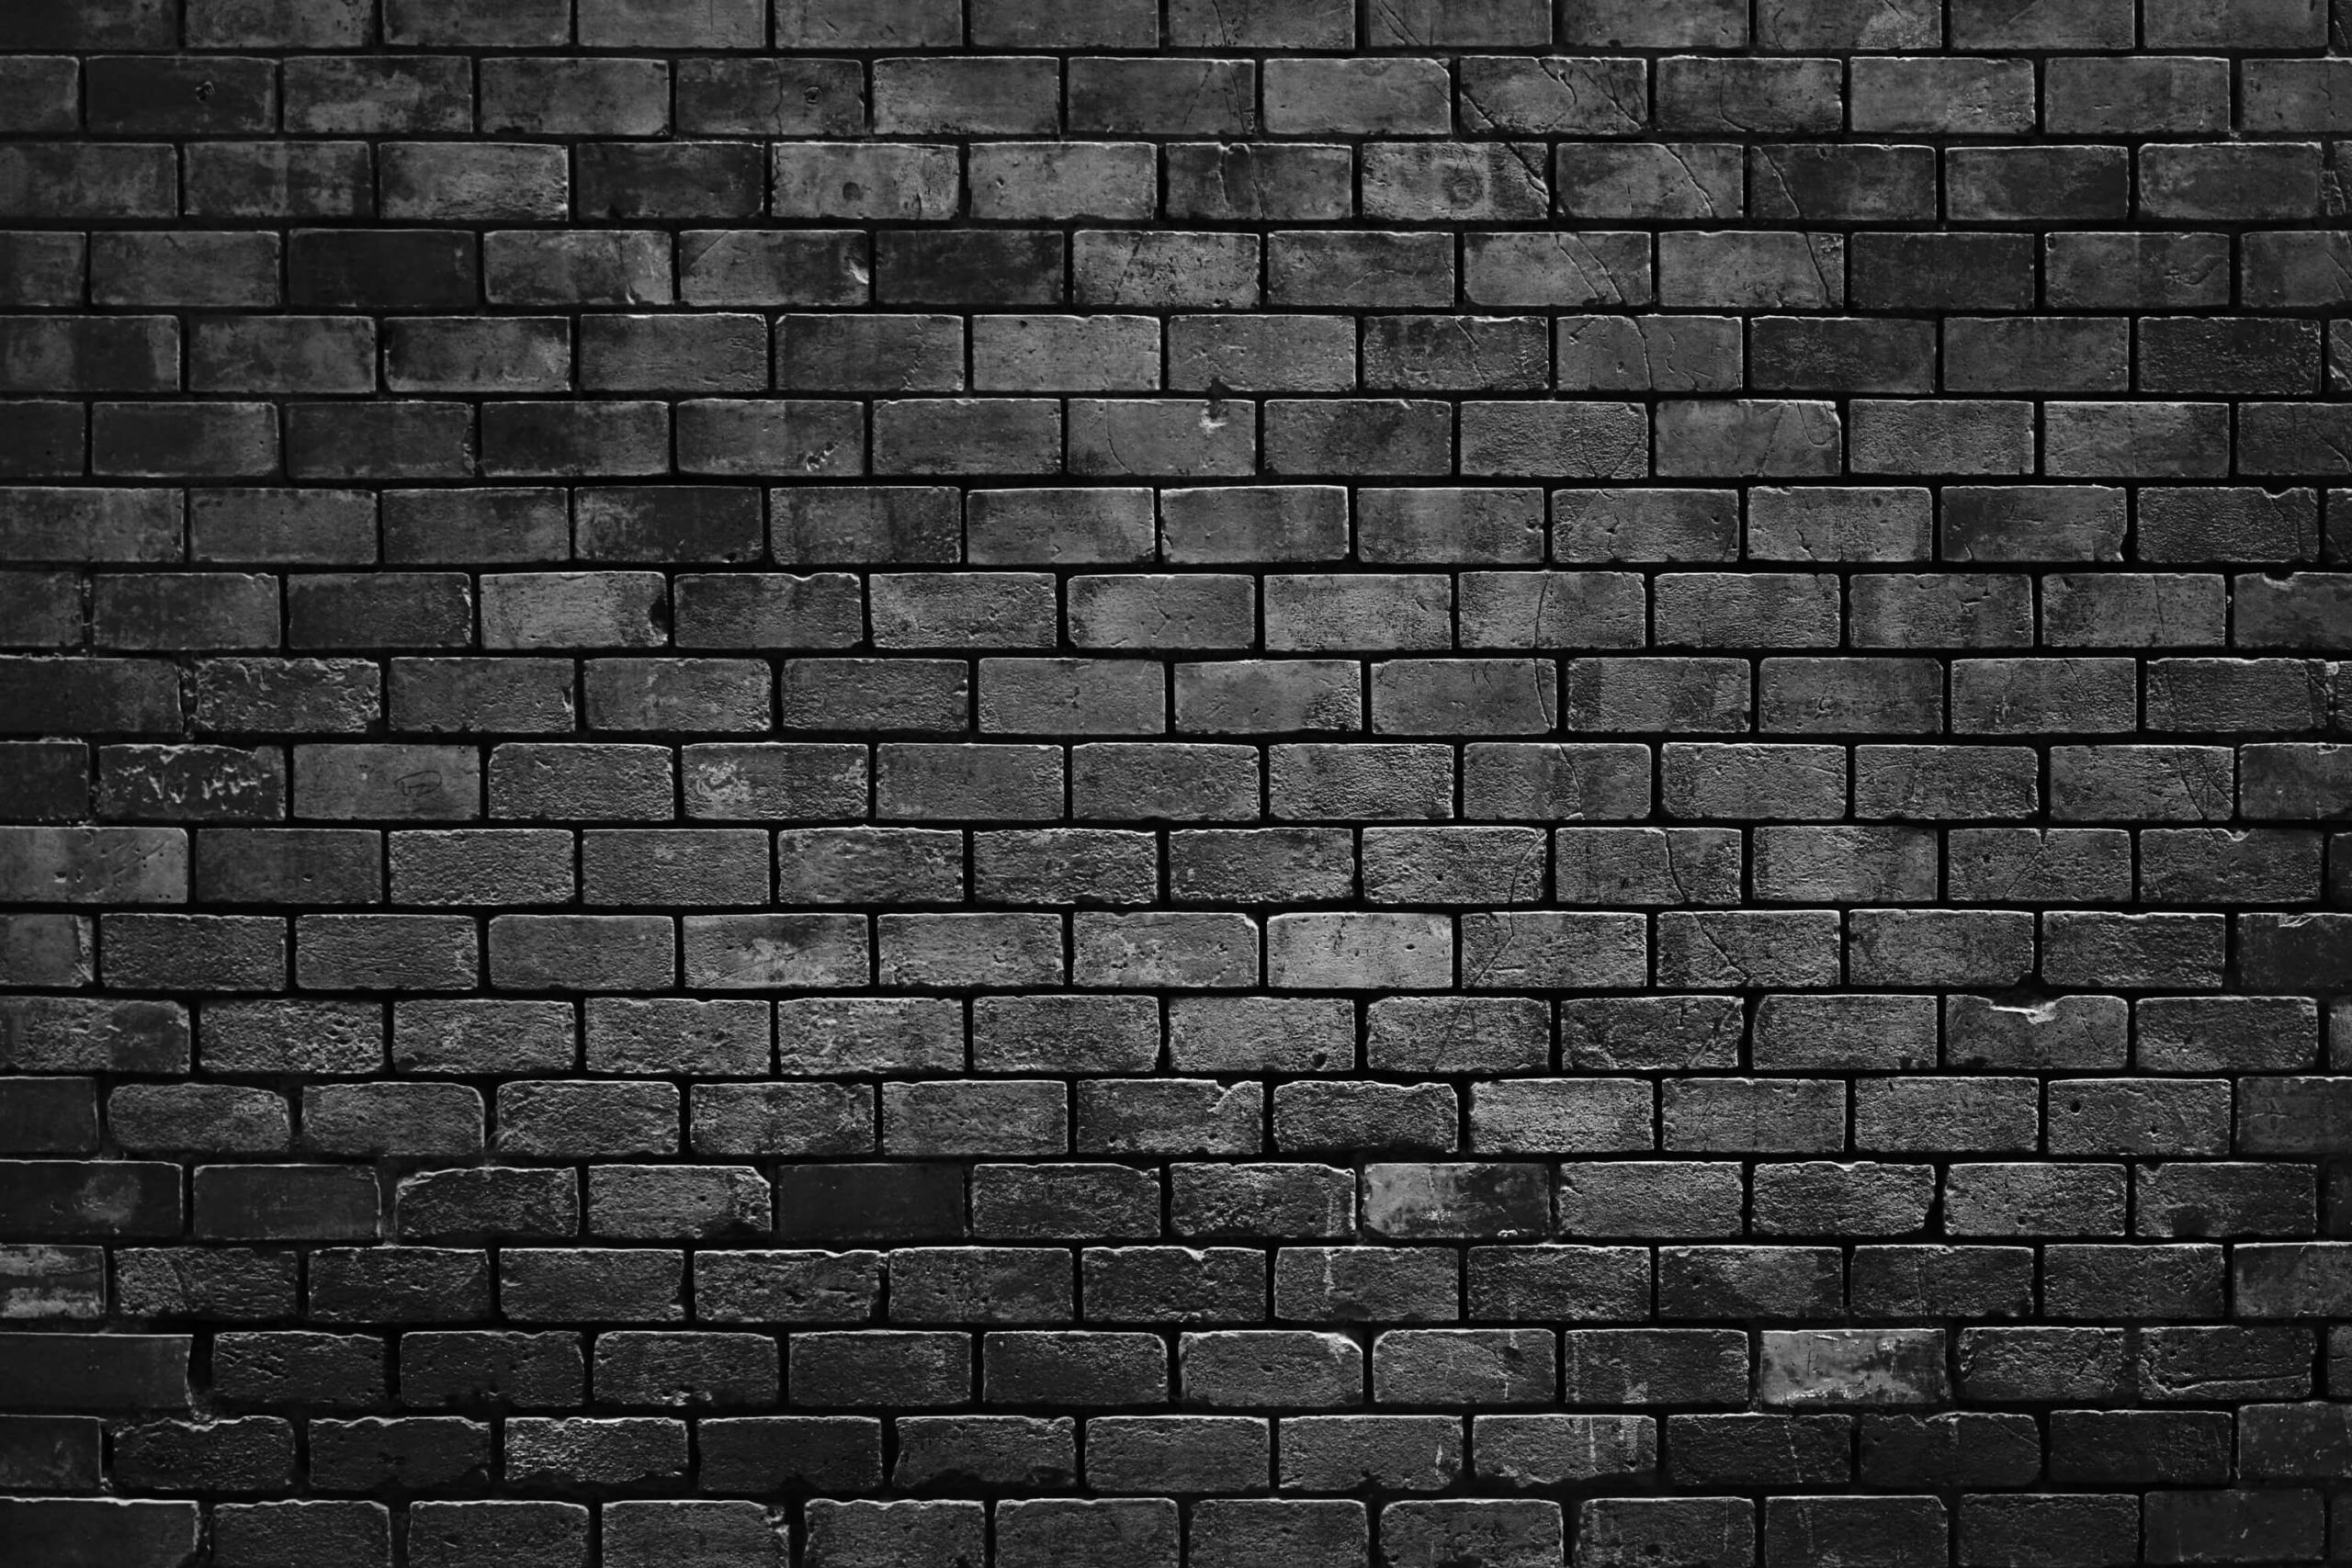 Black Brick Wallpaper – Enhancing Your Interior Decor With Background decoration